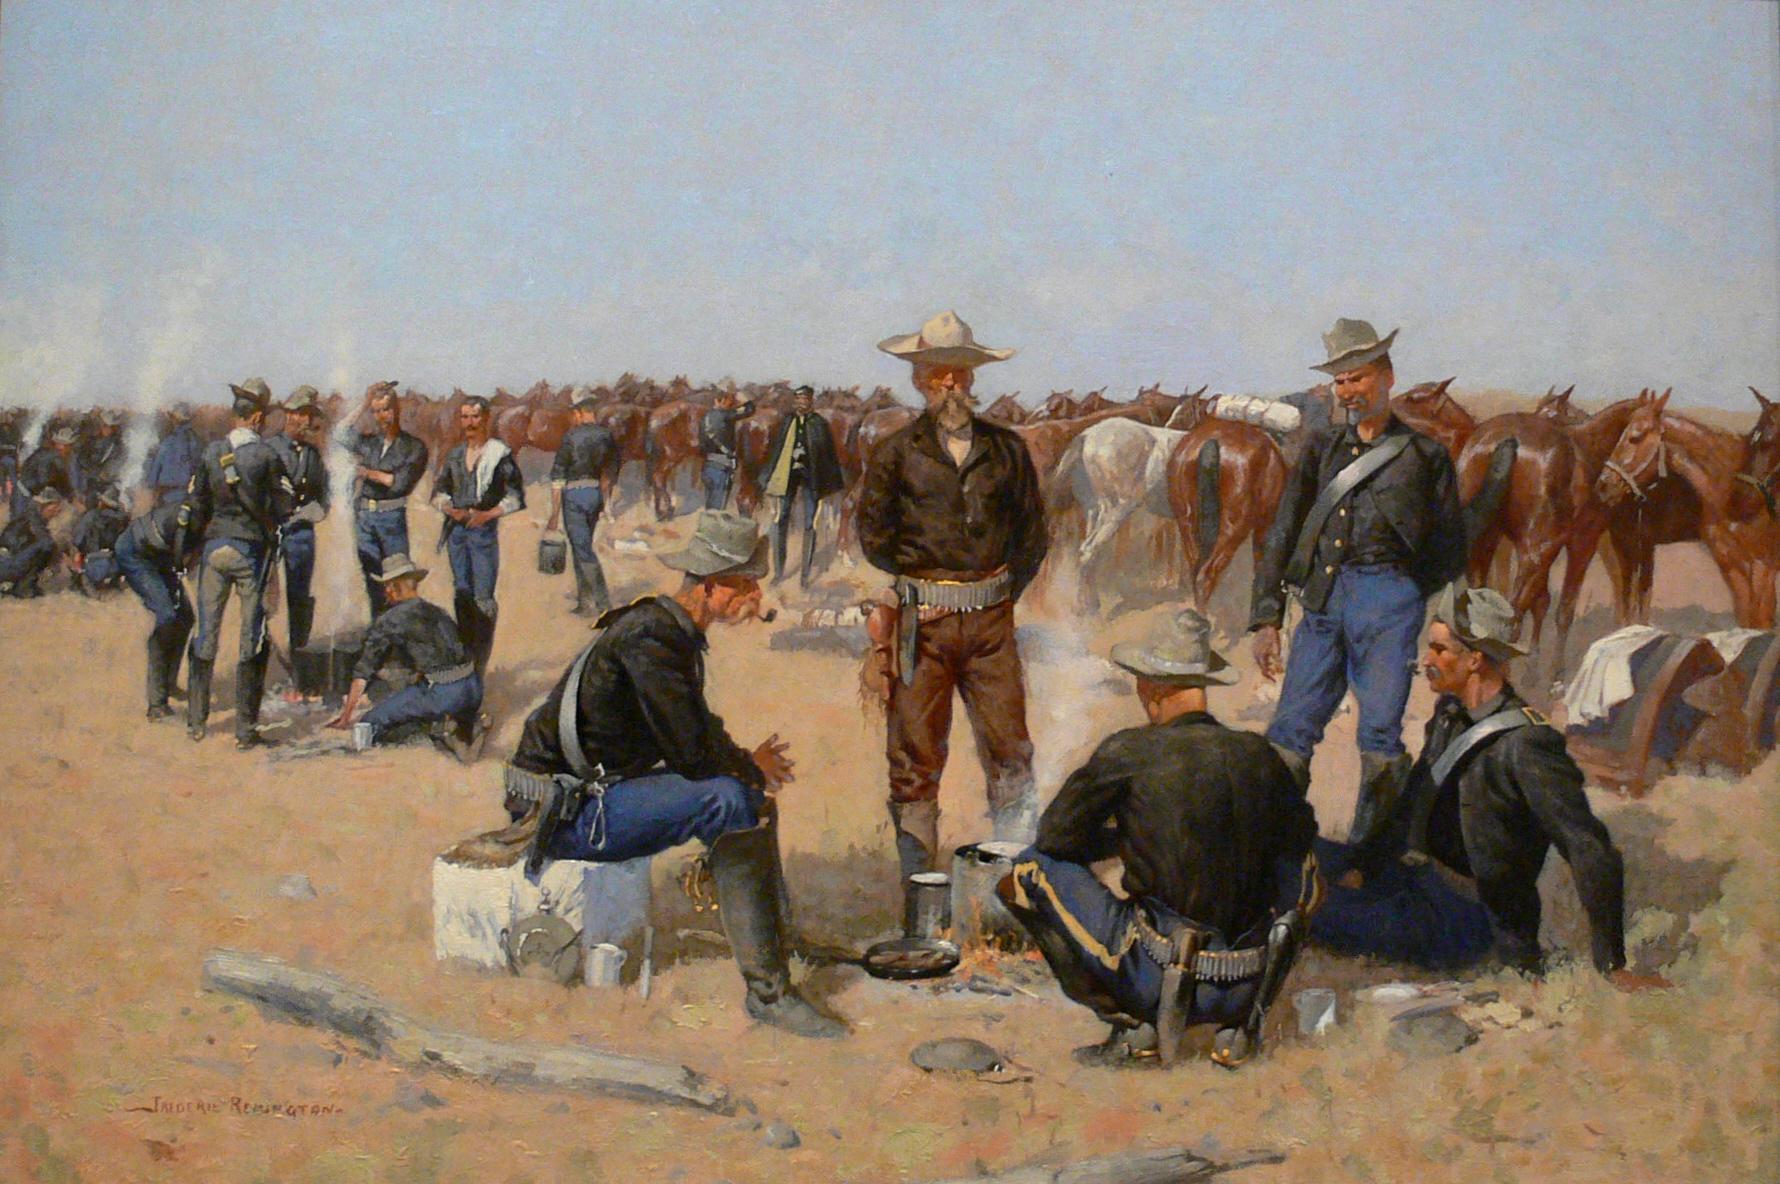 File:Remington A Cavalrymans Breakfast on the Plains c1892.jpg - Wikipedia